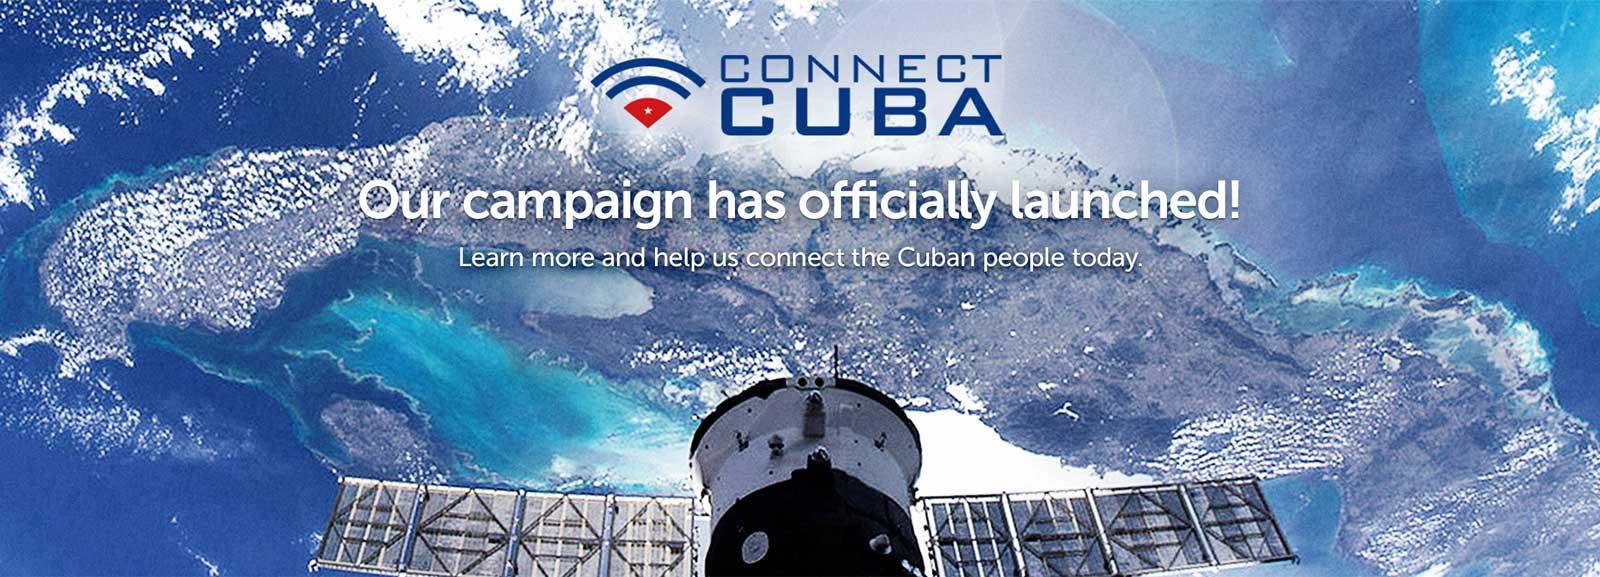 Connect Cuba